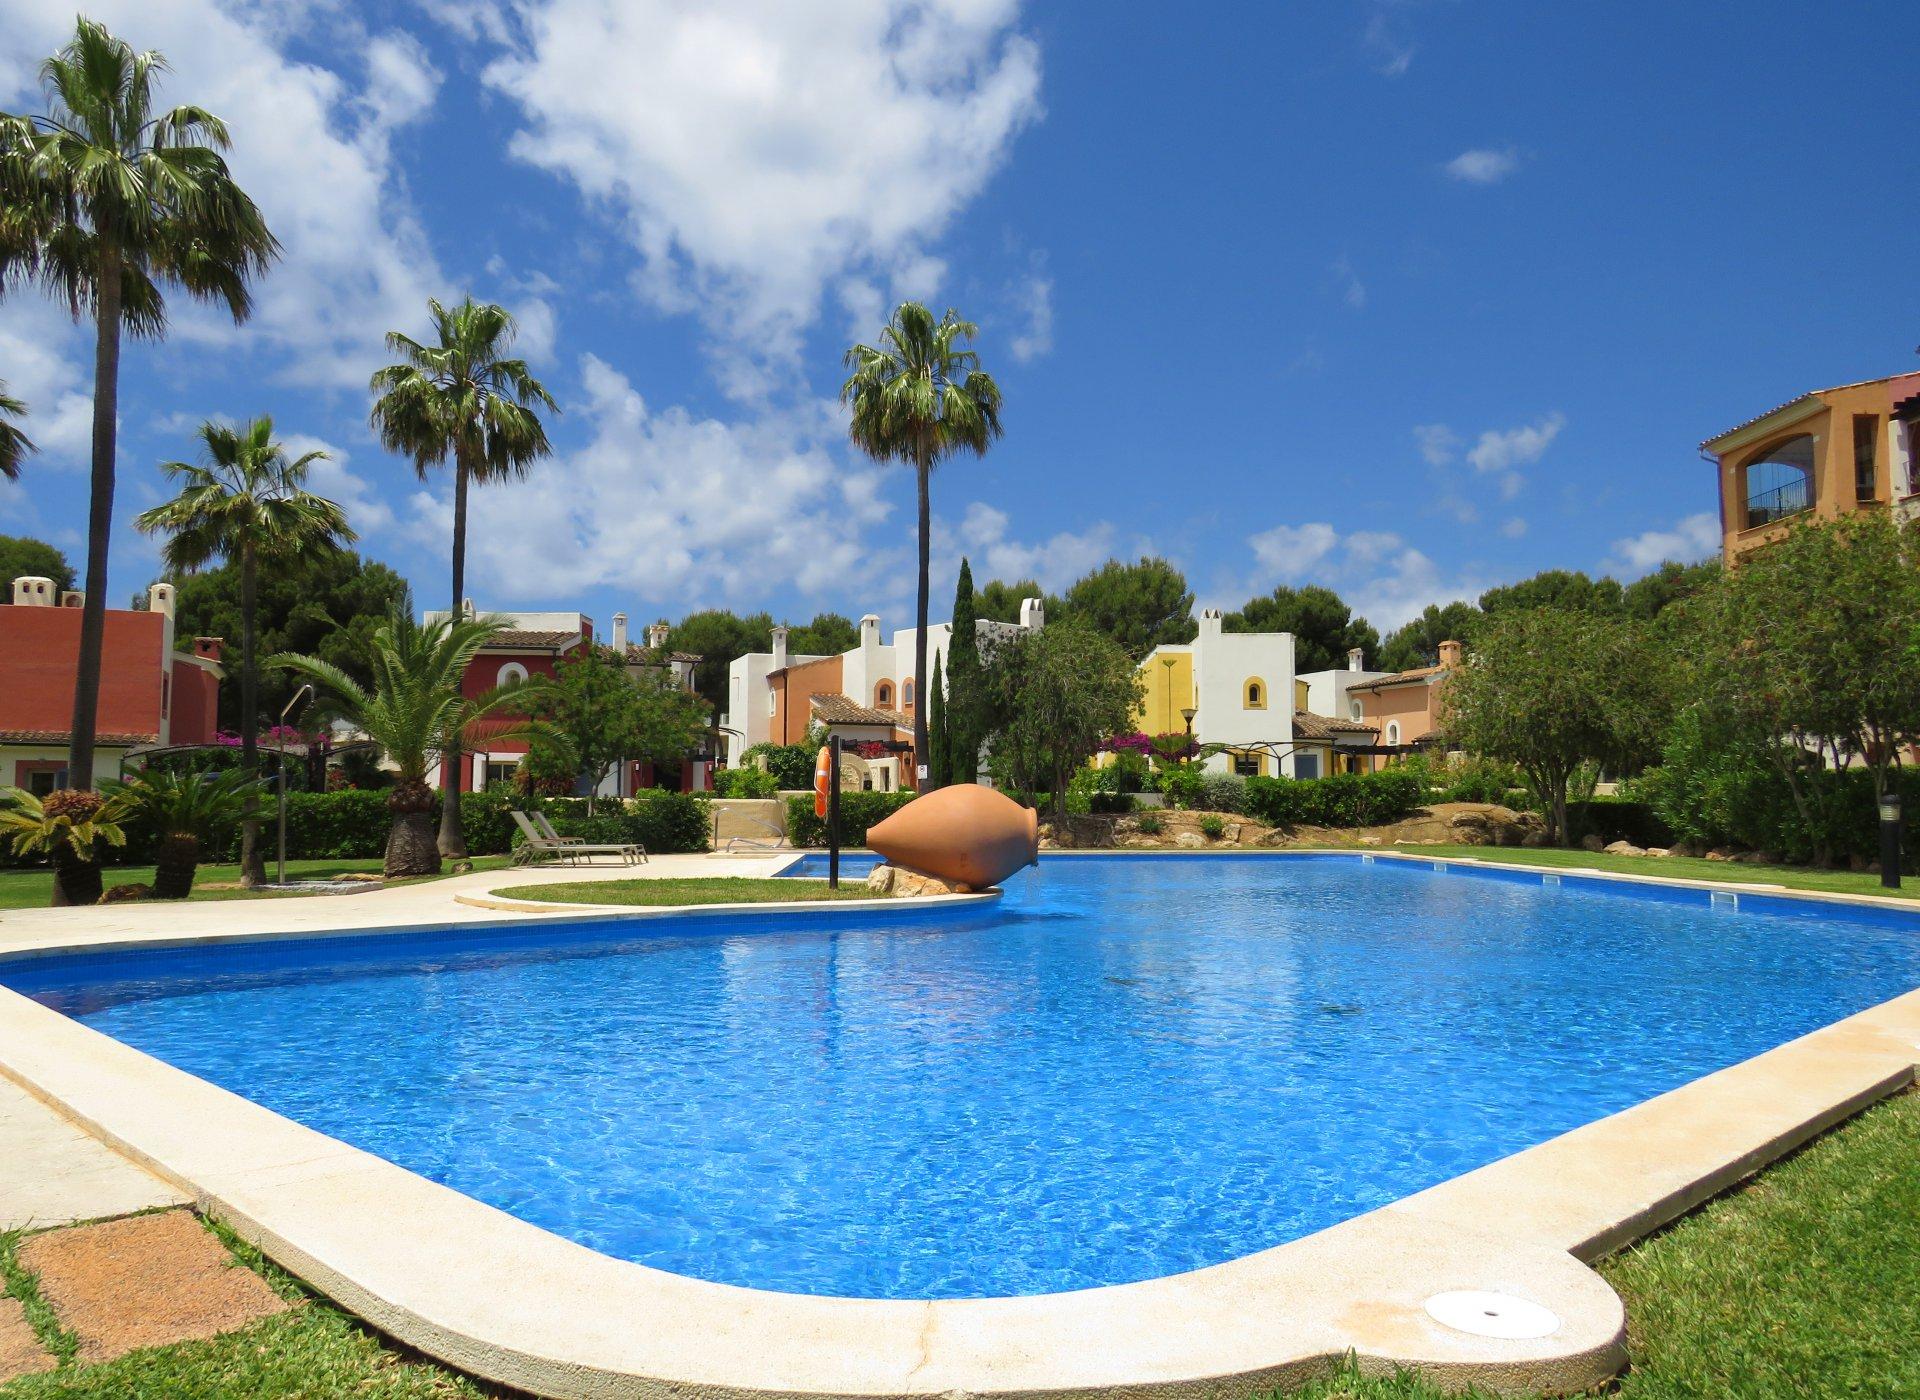 Ad Sale Apartment Santa Ponsa (07180) ref:V0333SP